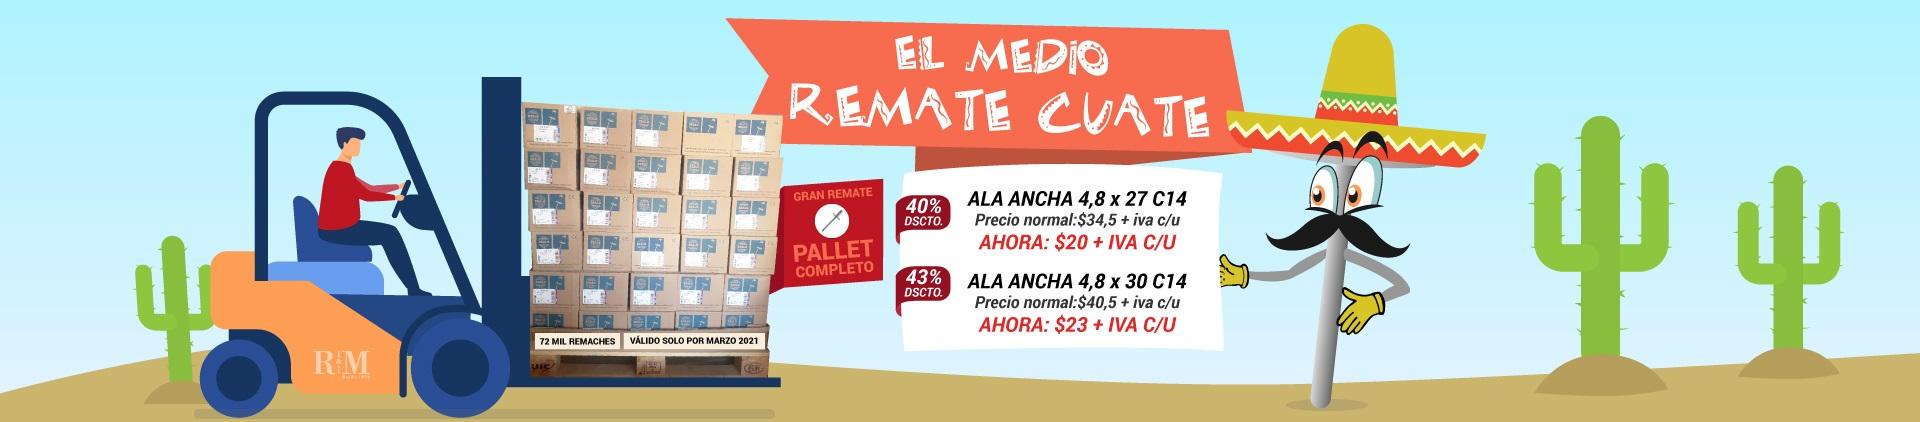 Slide-Remate_cuate